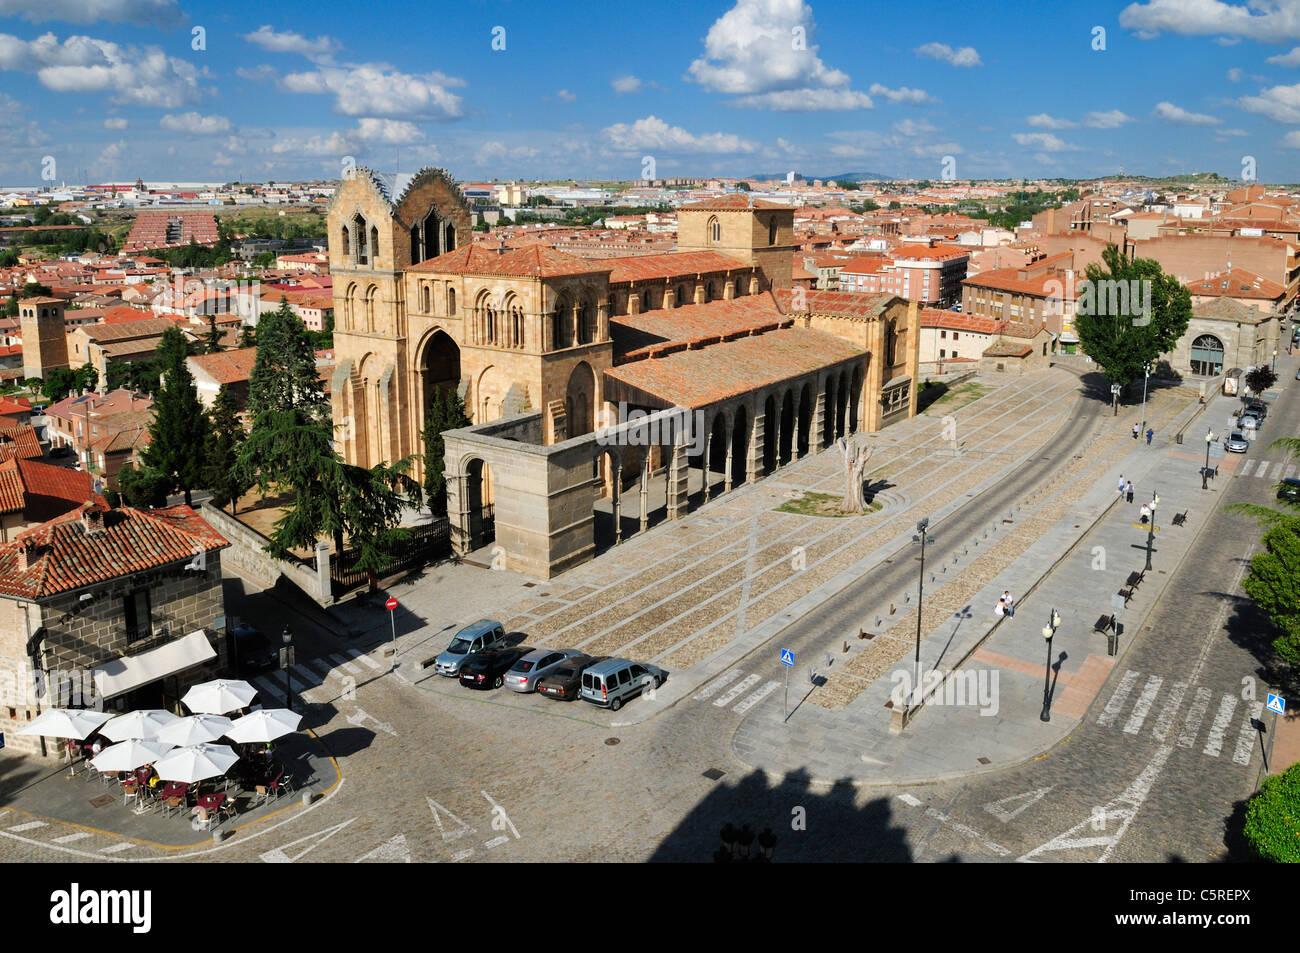 Europe, Spain, Castile and Leon, Avila, View of cityscape - Stock Image